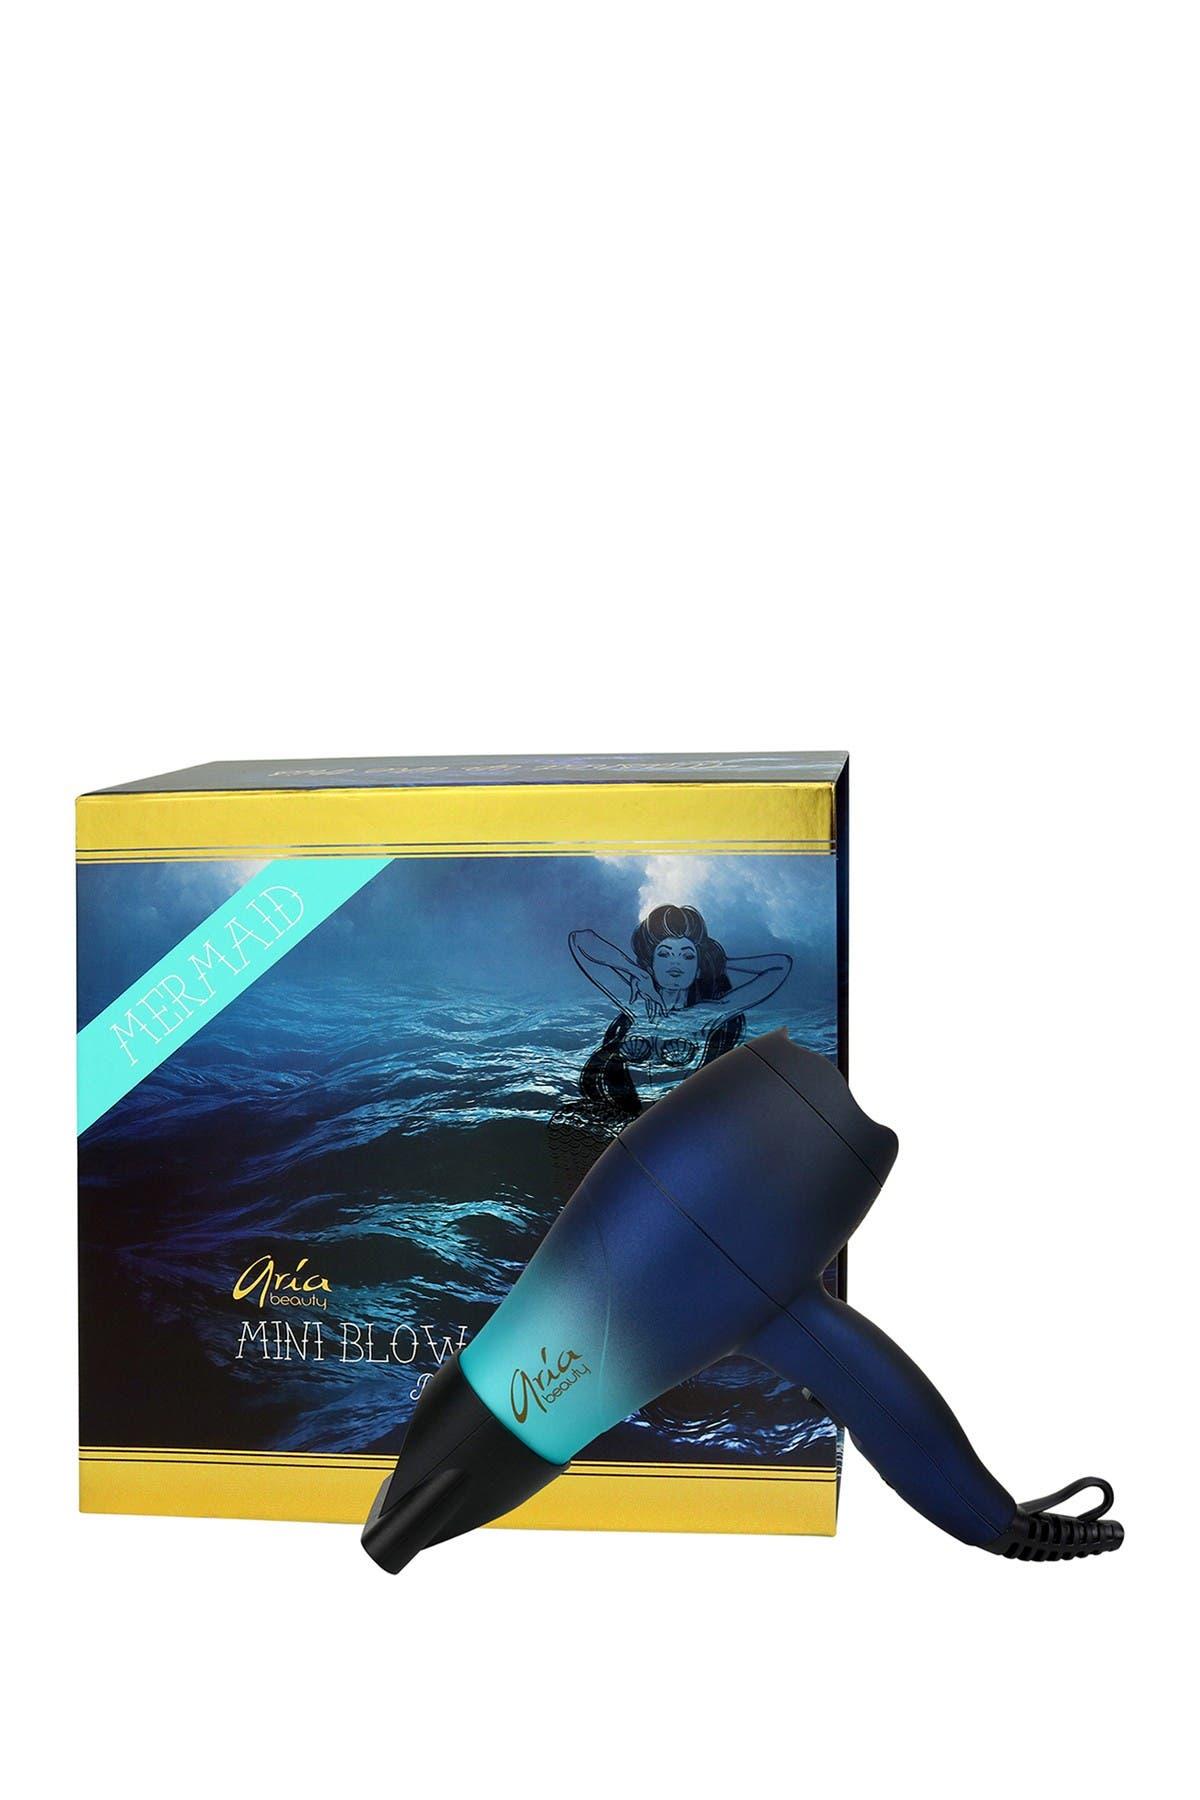 ARIA Mermaid Mini Blow Dryer & Hair Diffuser